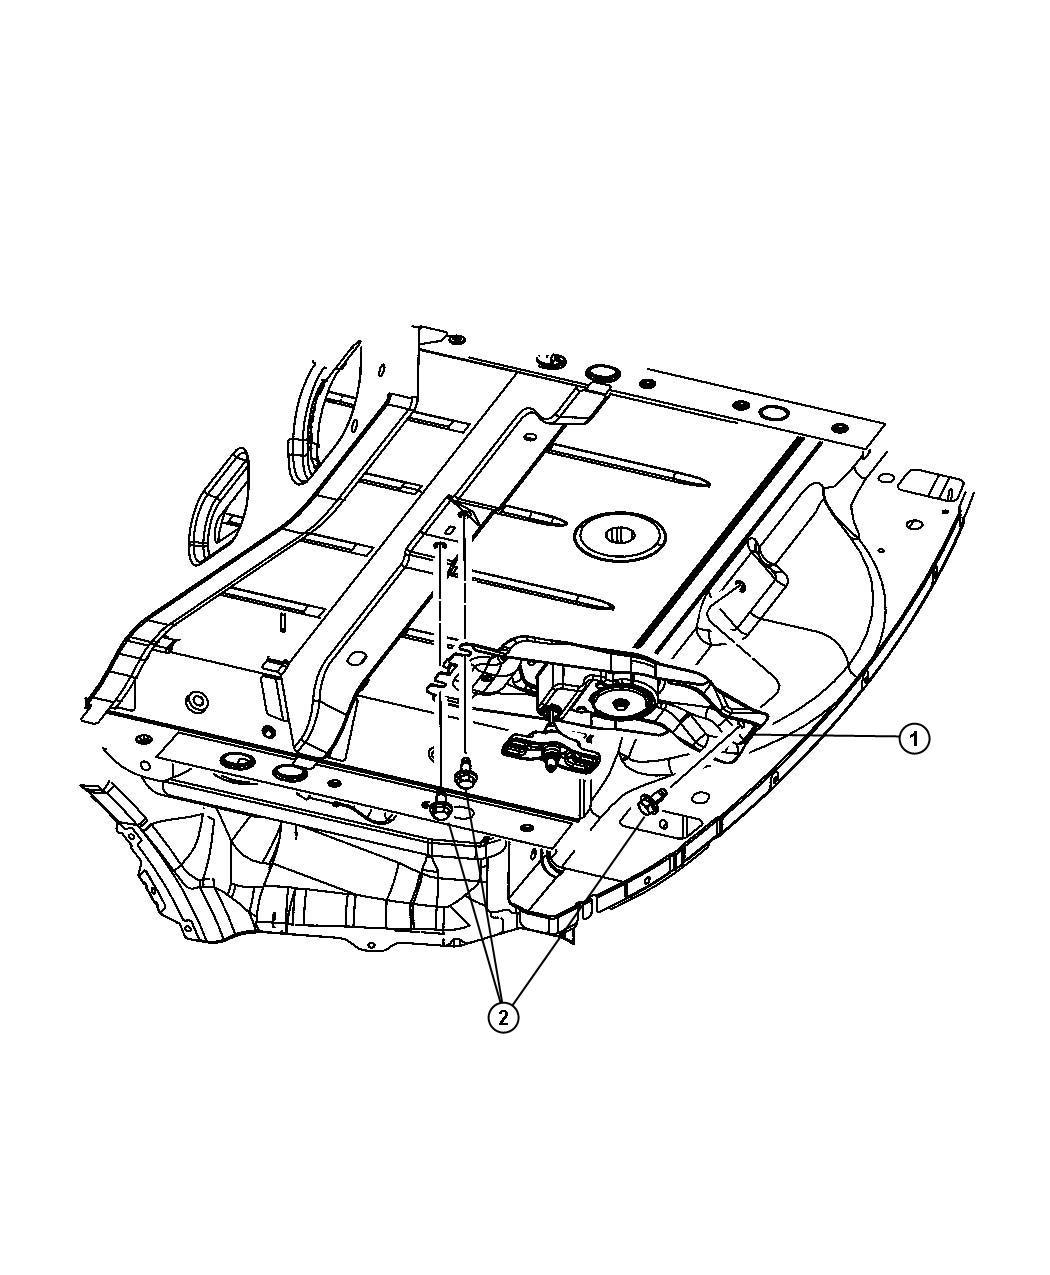 2000 bmw 323i interior diagram wiring diagram and fuse box 2011 chrysler 200 touring convertible interior